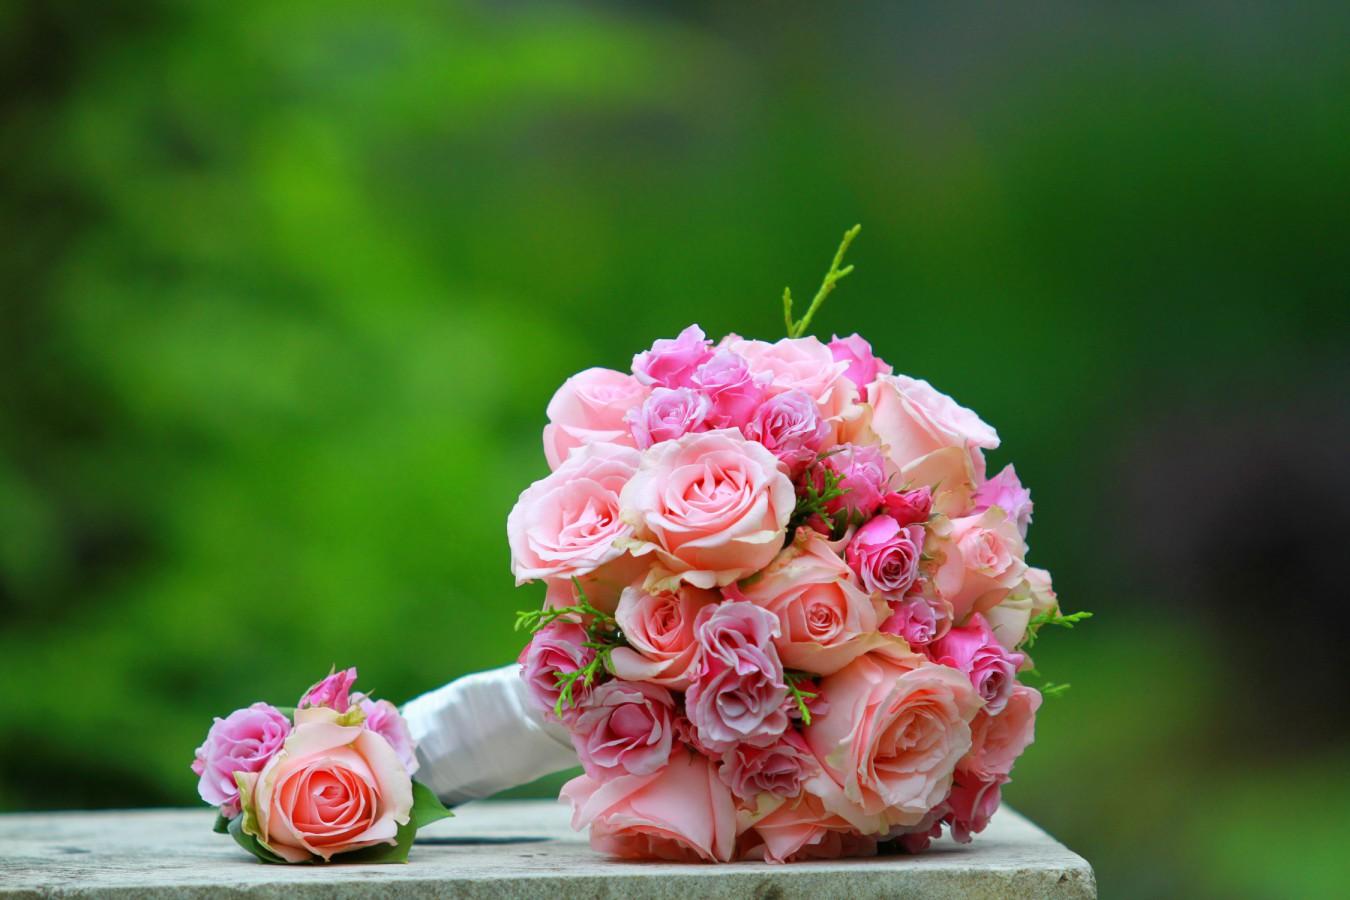 Personal Flower Landscape.7